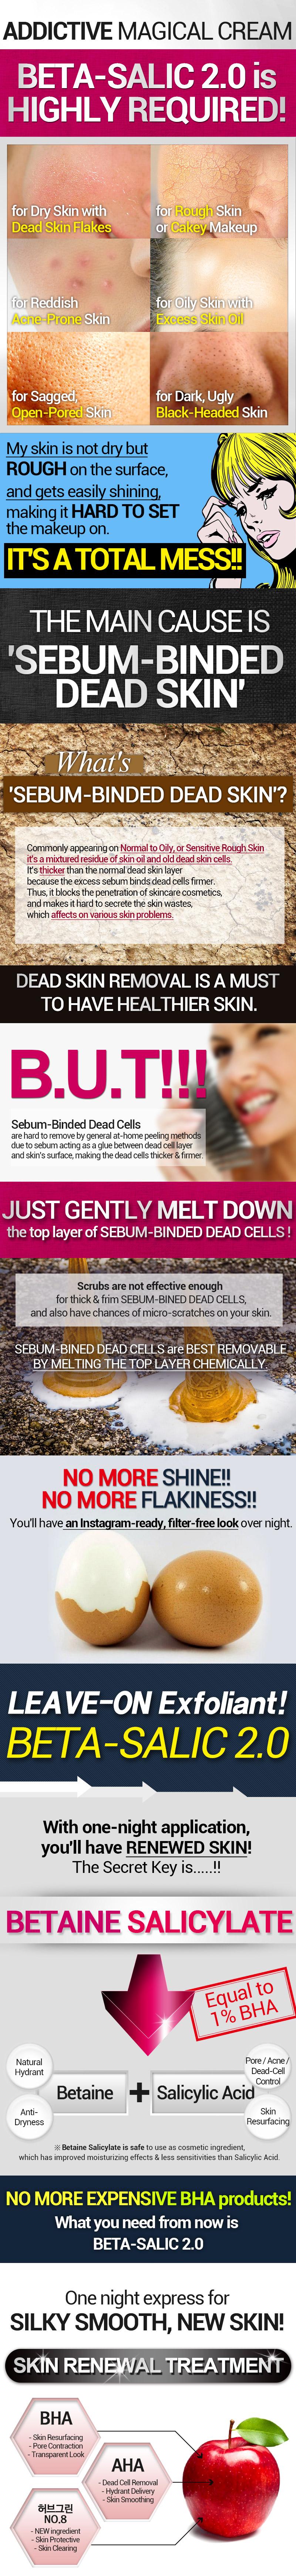 Beta Salic 2.0 cream